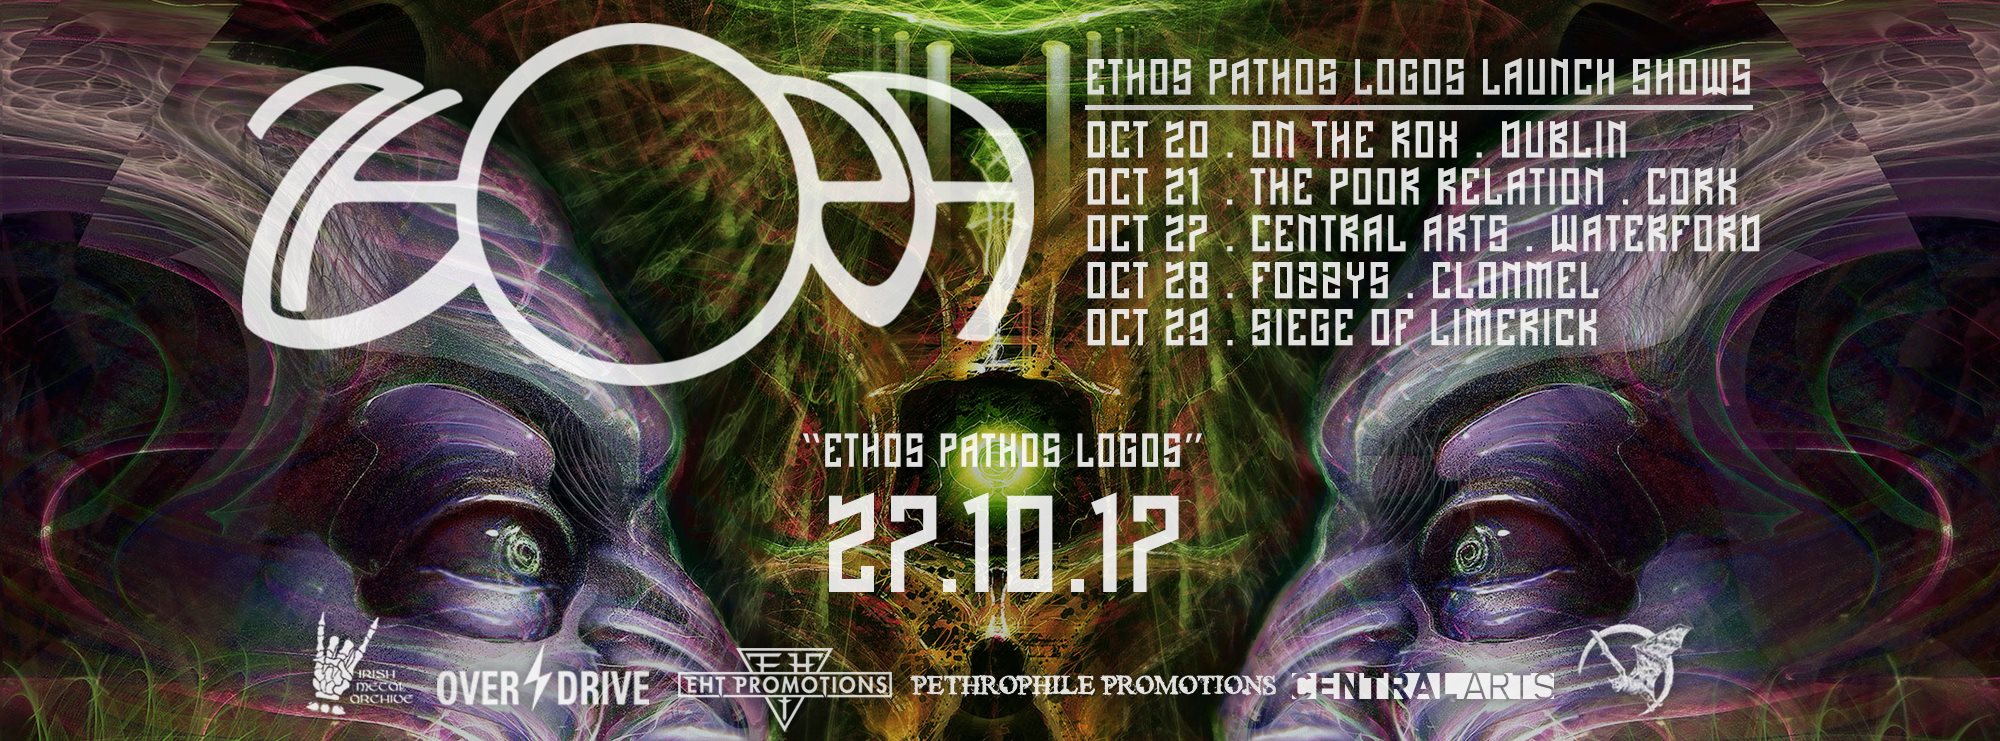 pathos logos review